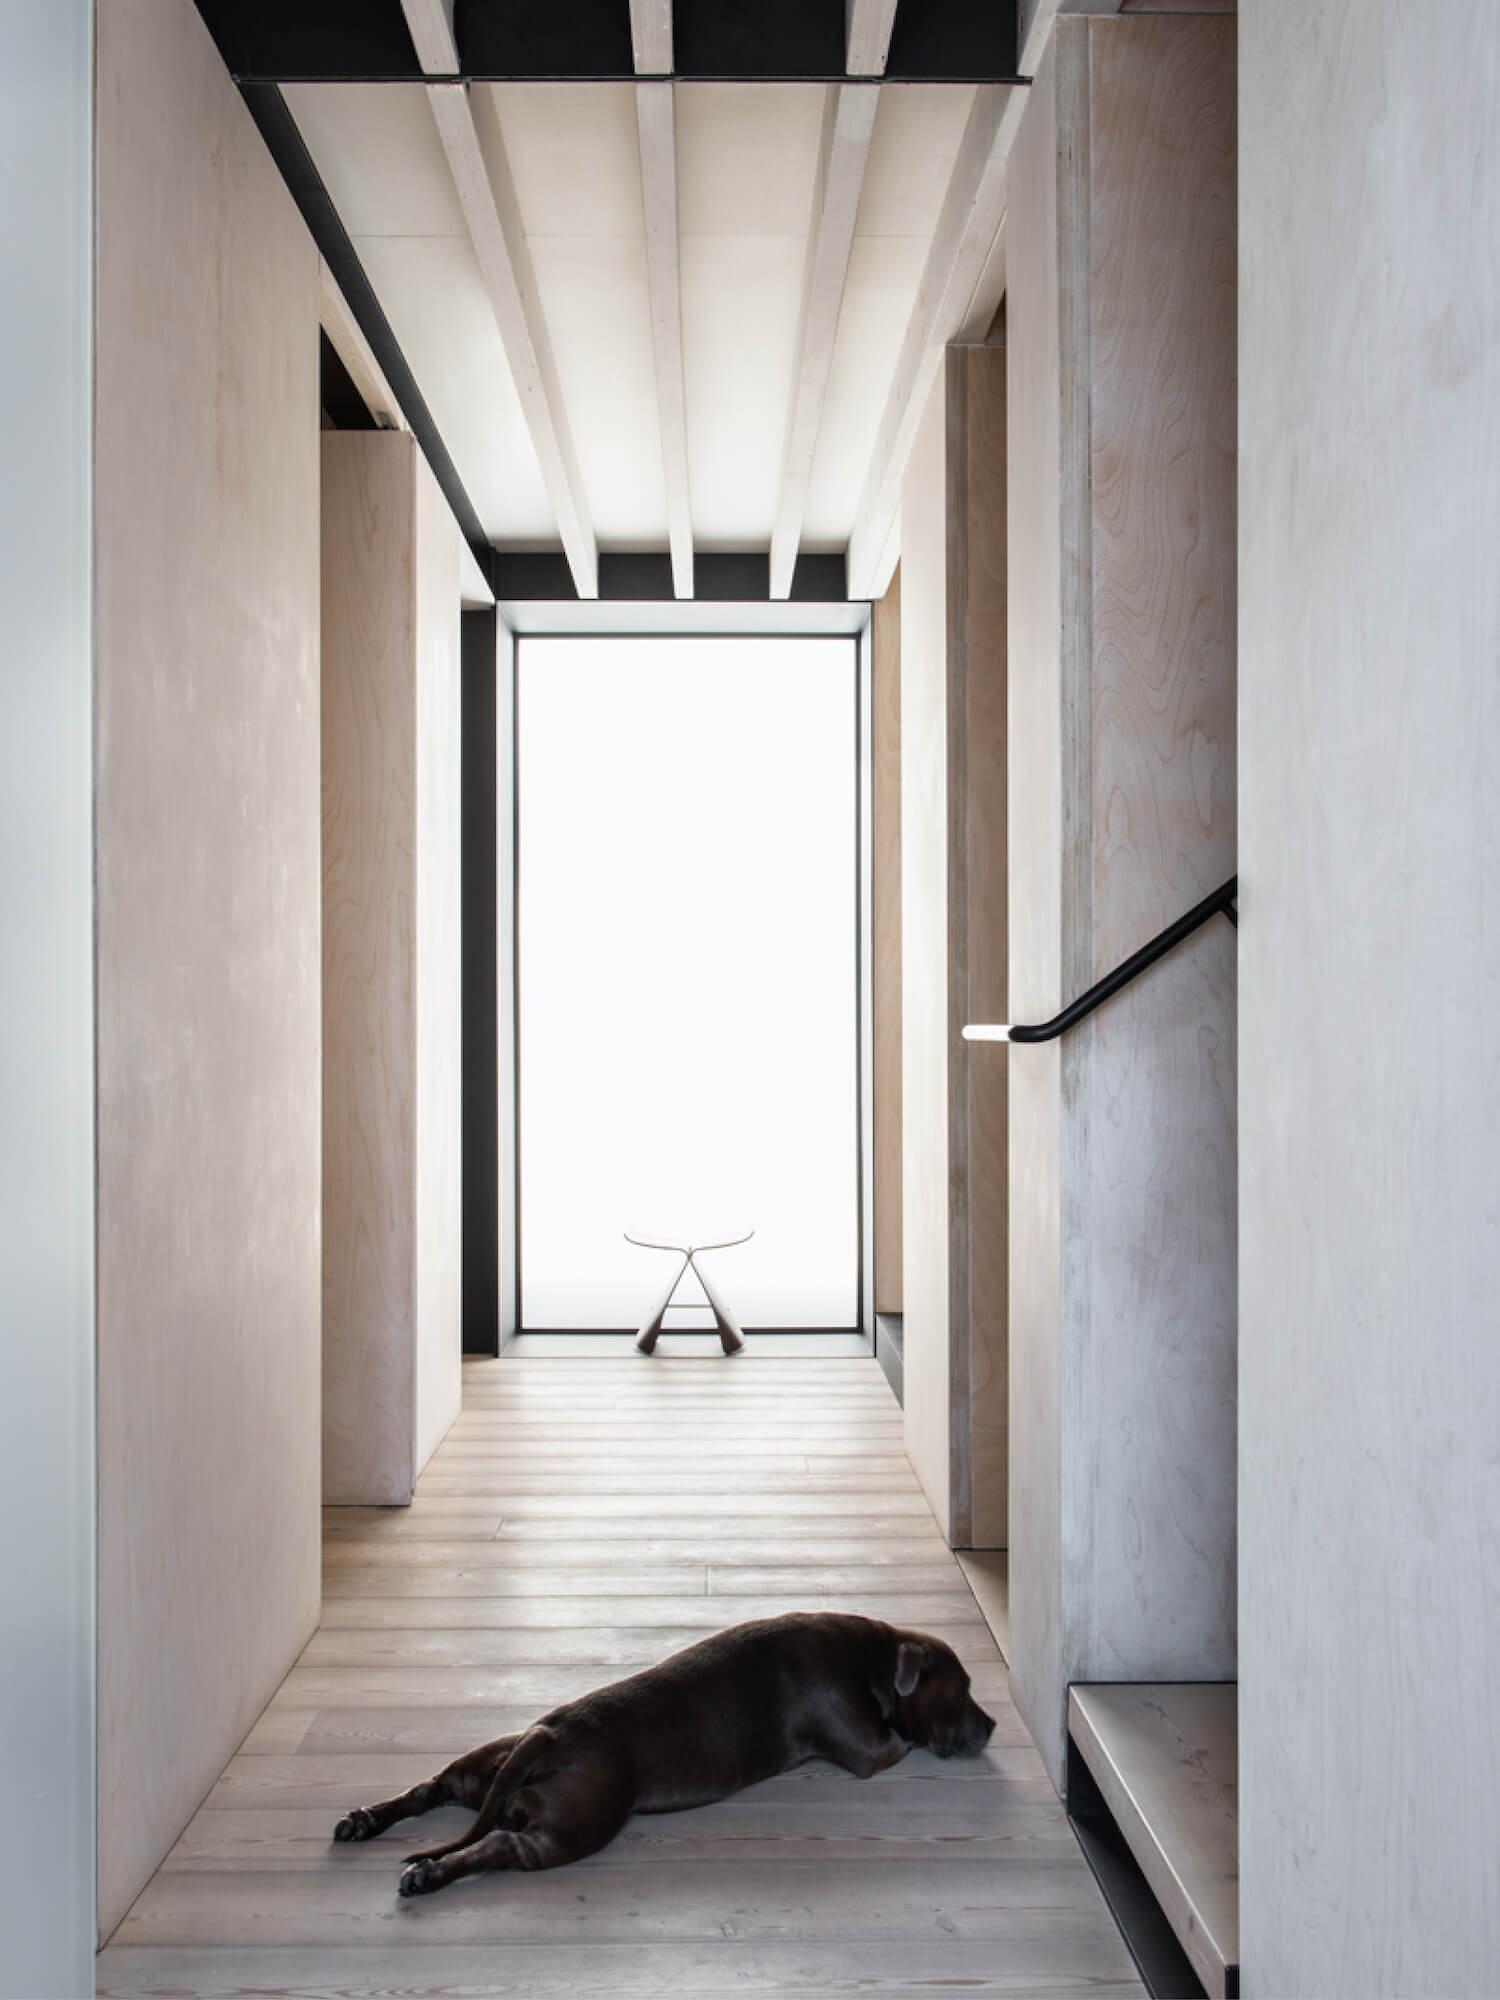 est living resident dog nicole england 13